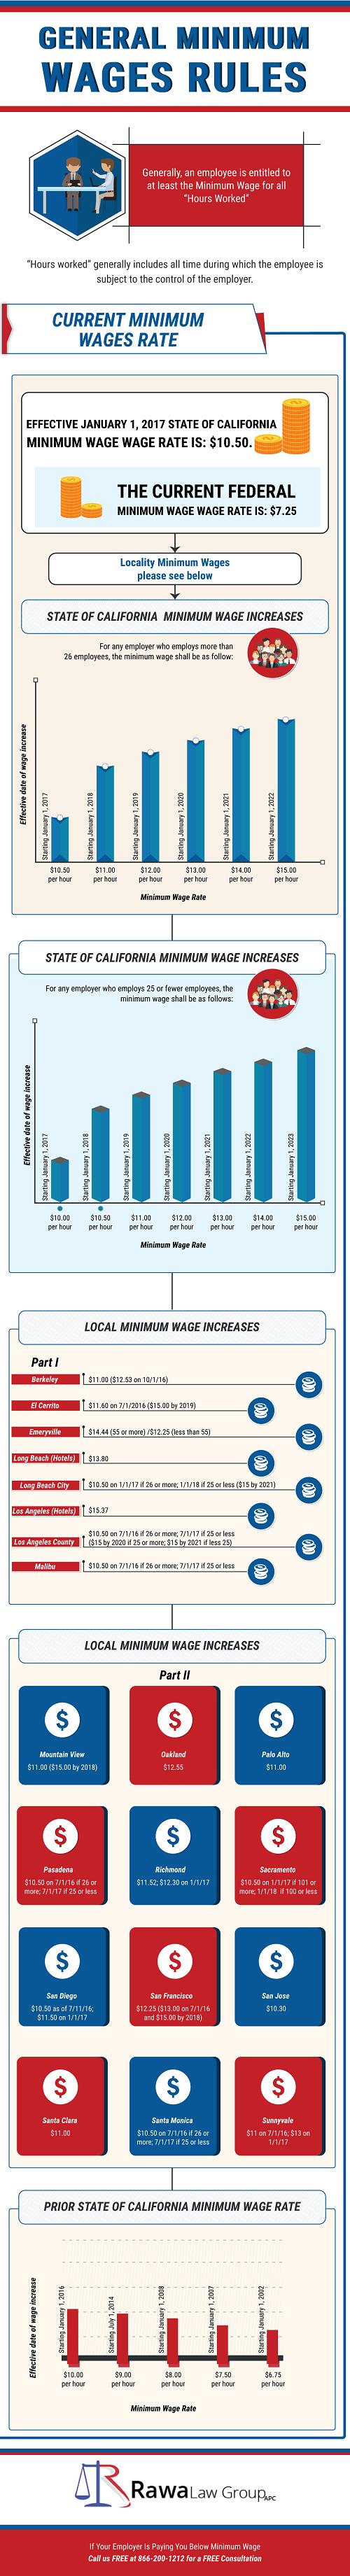 zrawa-minimum-wage-infographic looking forward